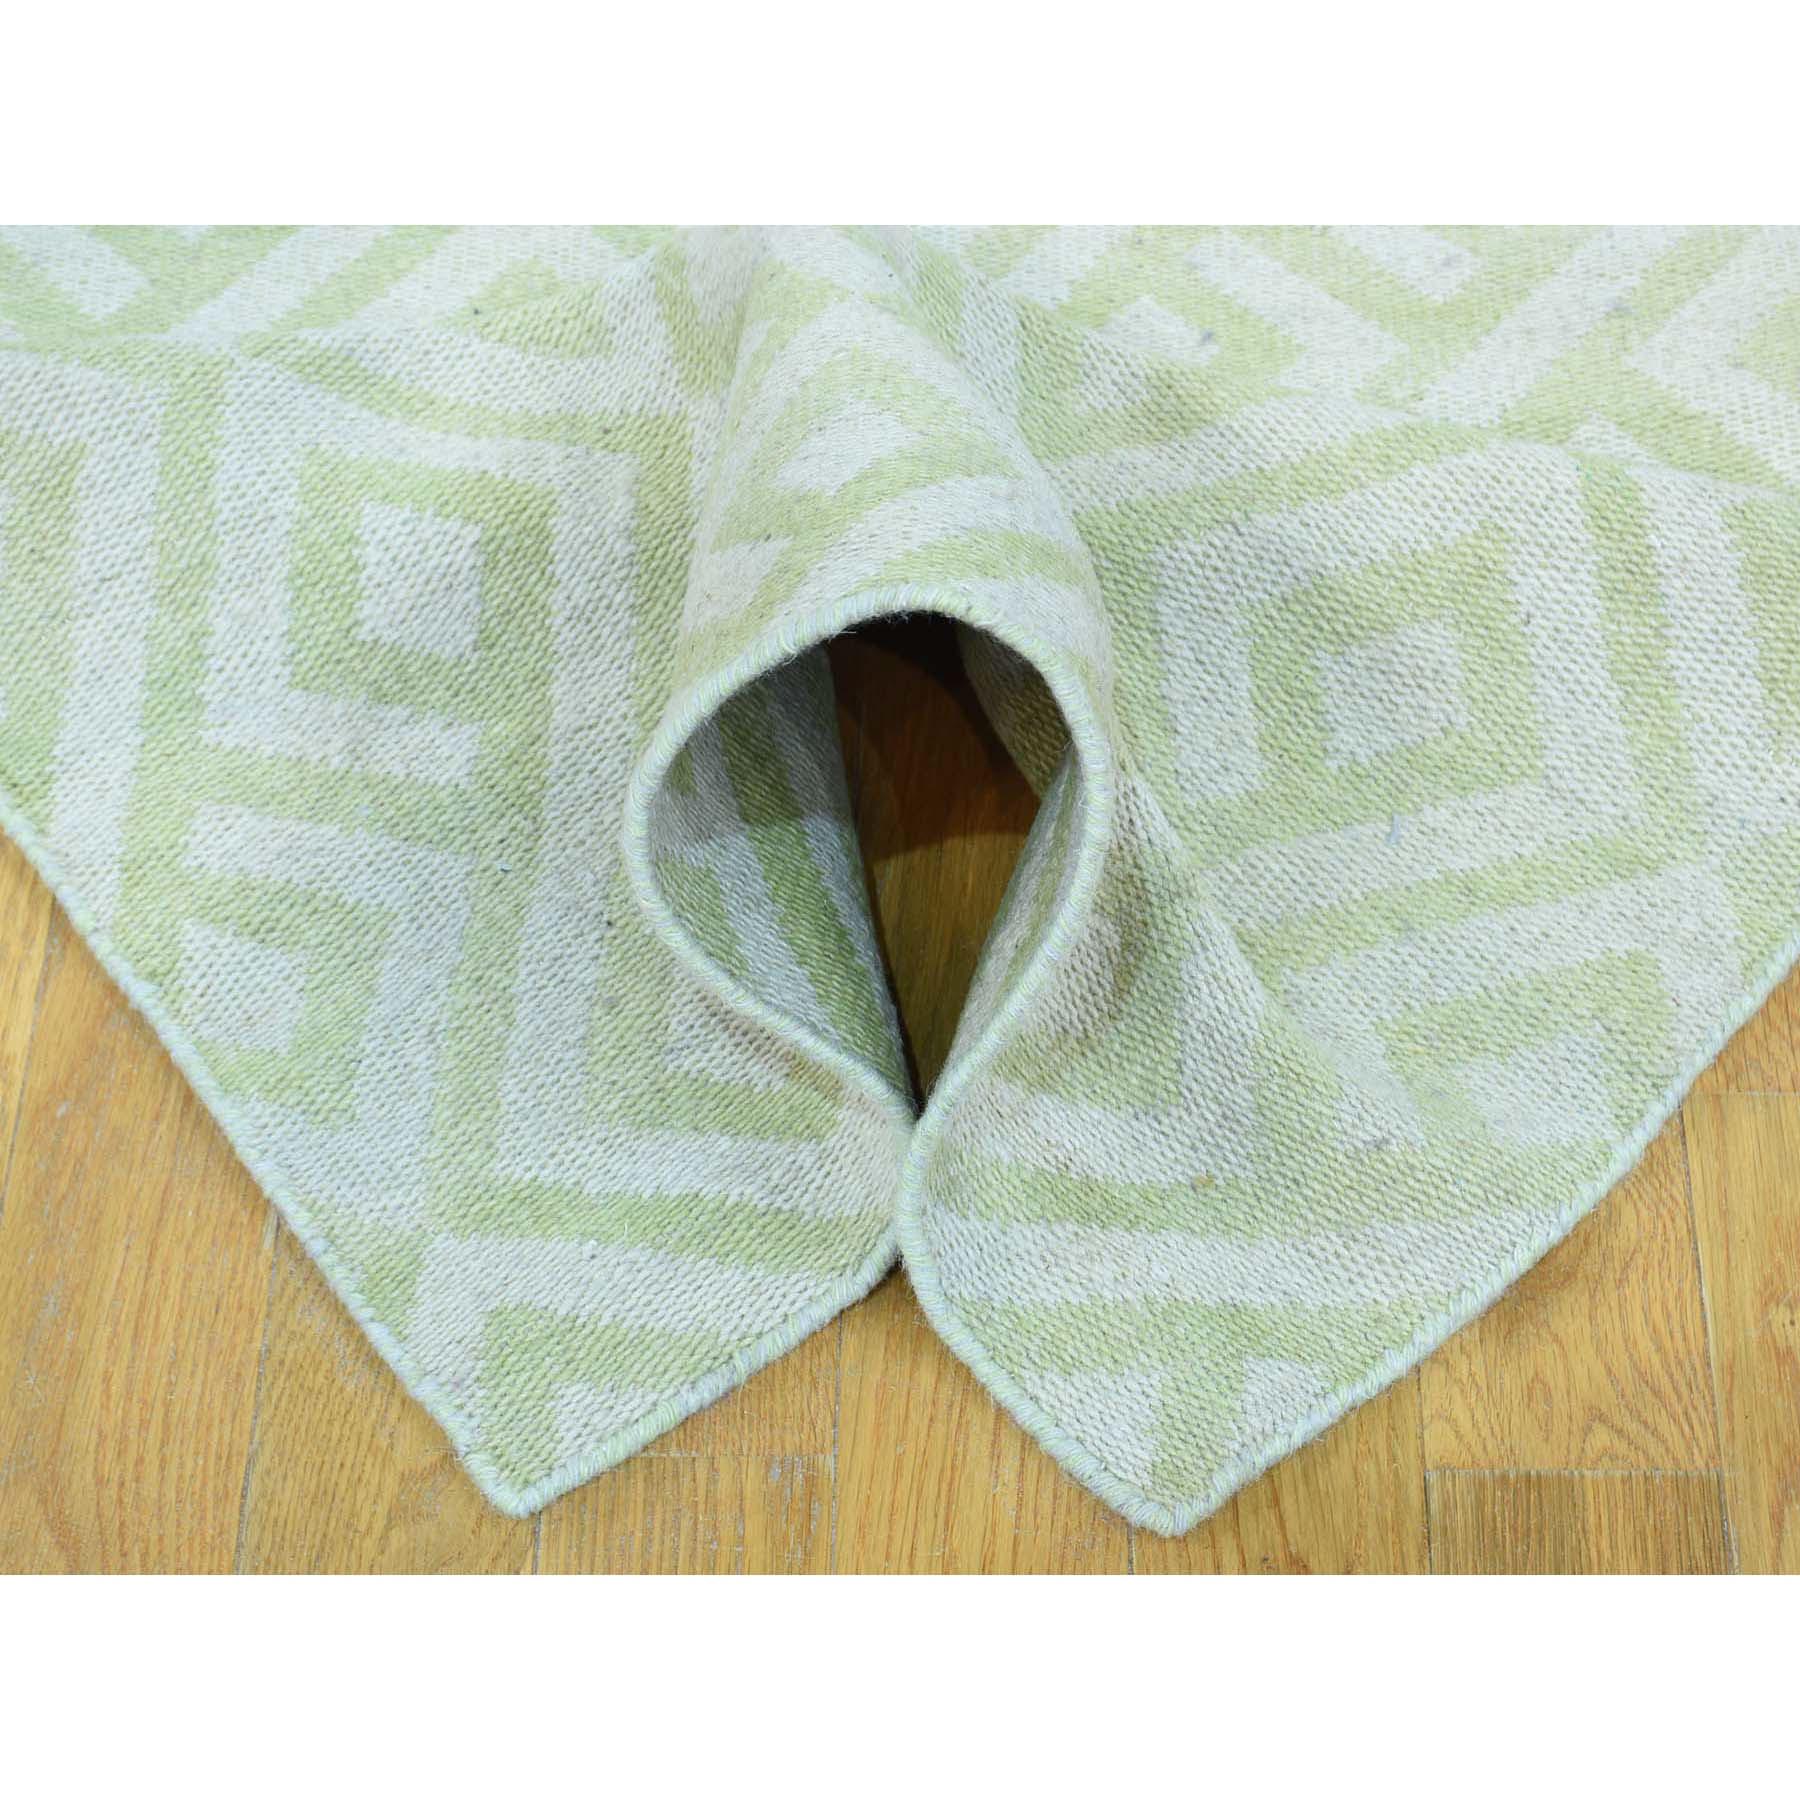 2-6--x10- Hand-Woven Flat Weave Reversible Durie Kilim Runner Rug